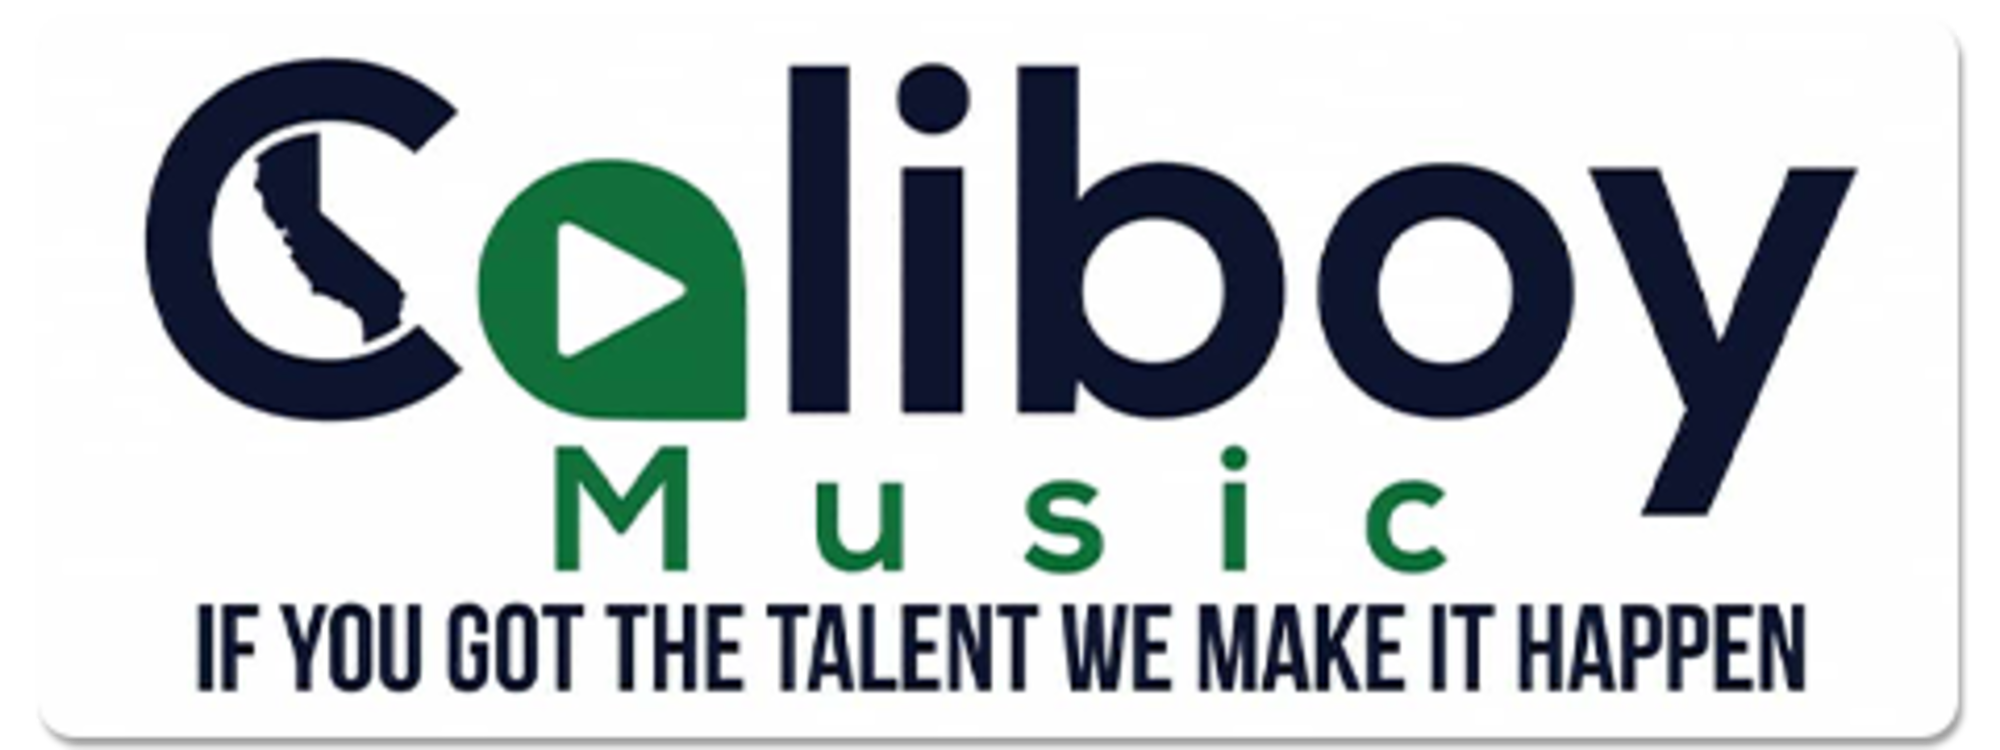 Caliboy Music